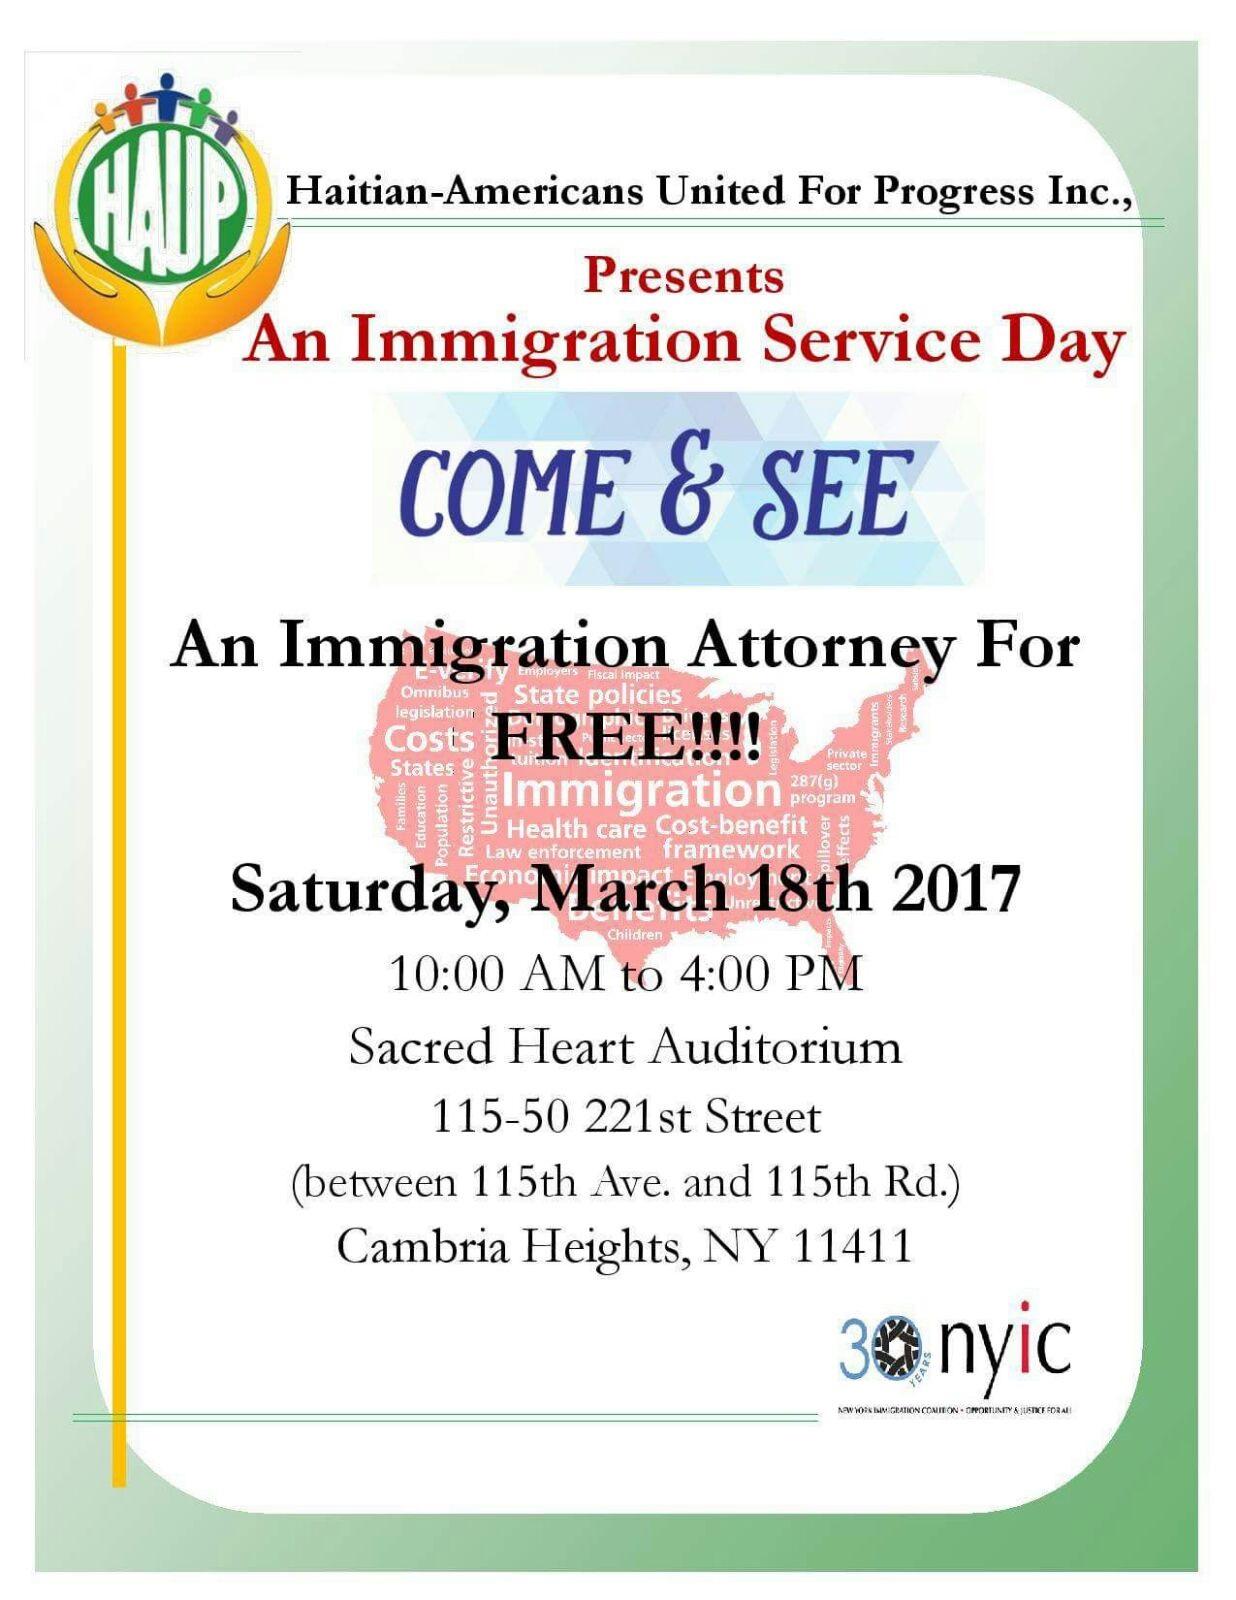 HAUP_Immigration_Service.jpg